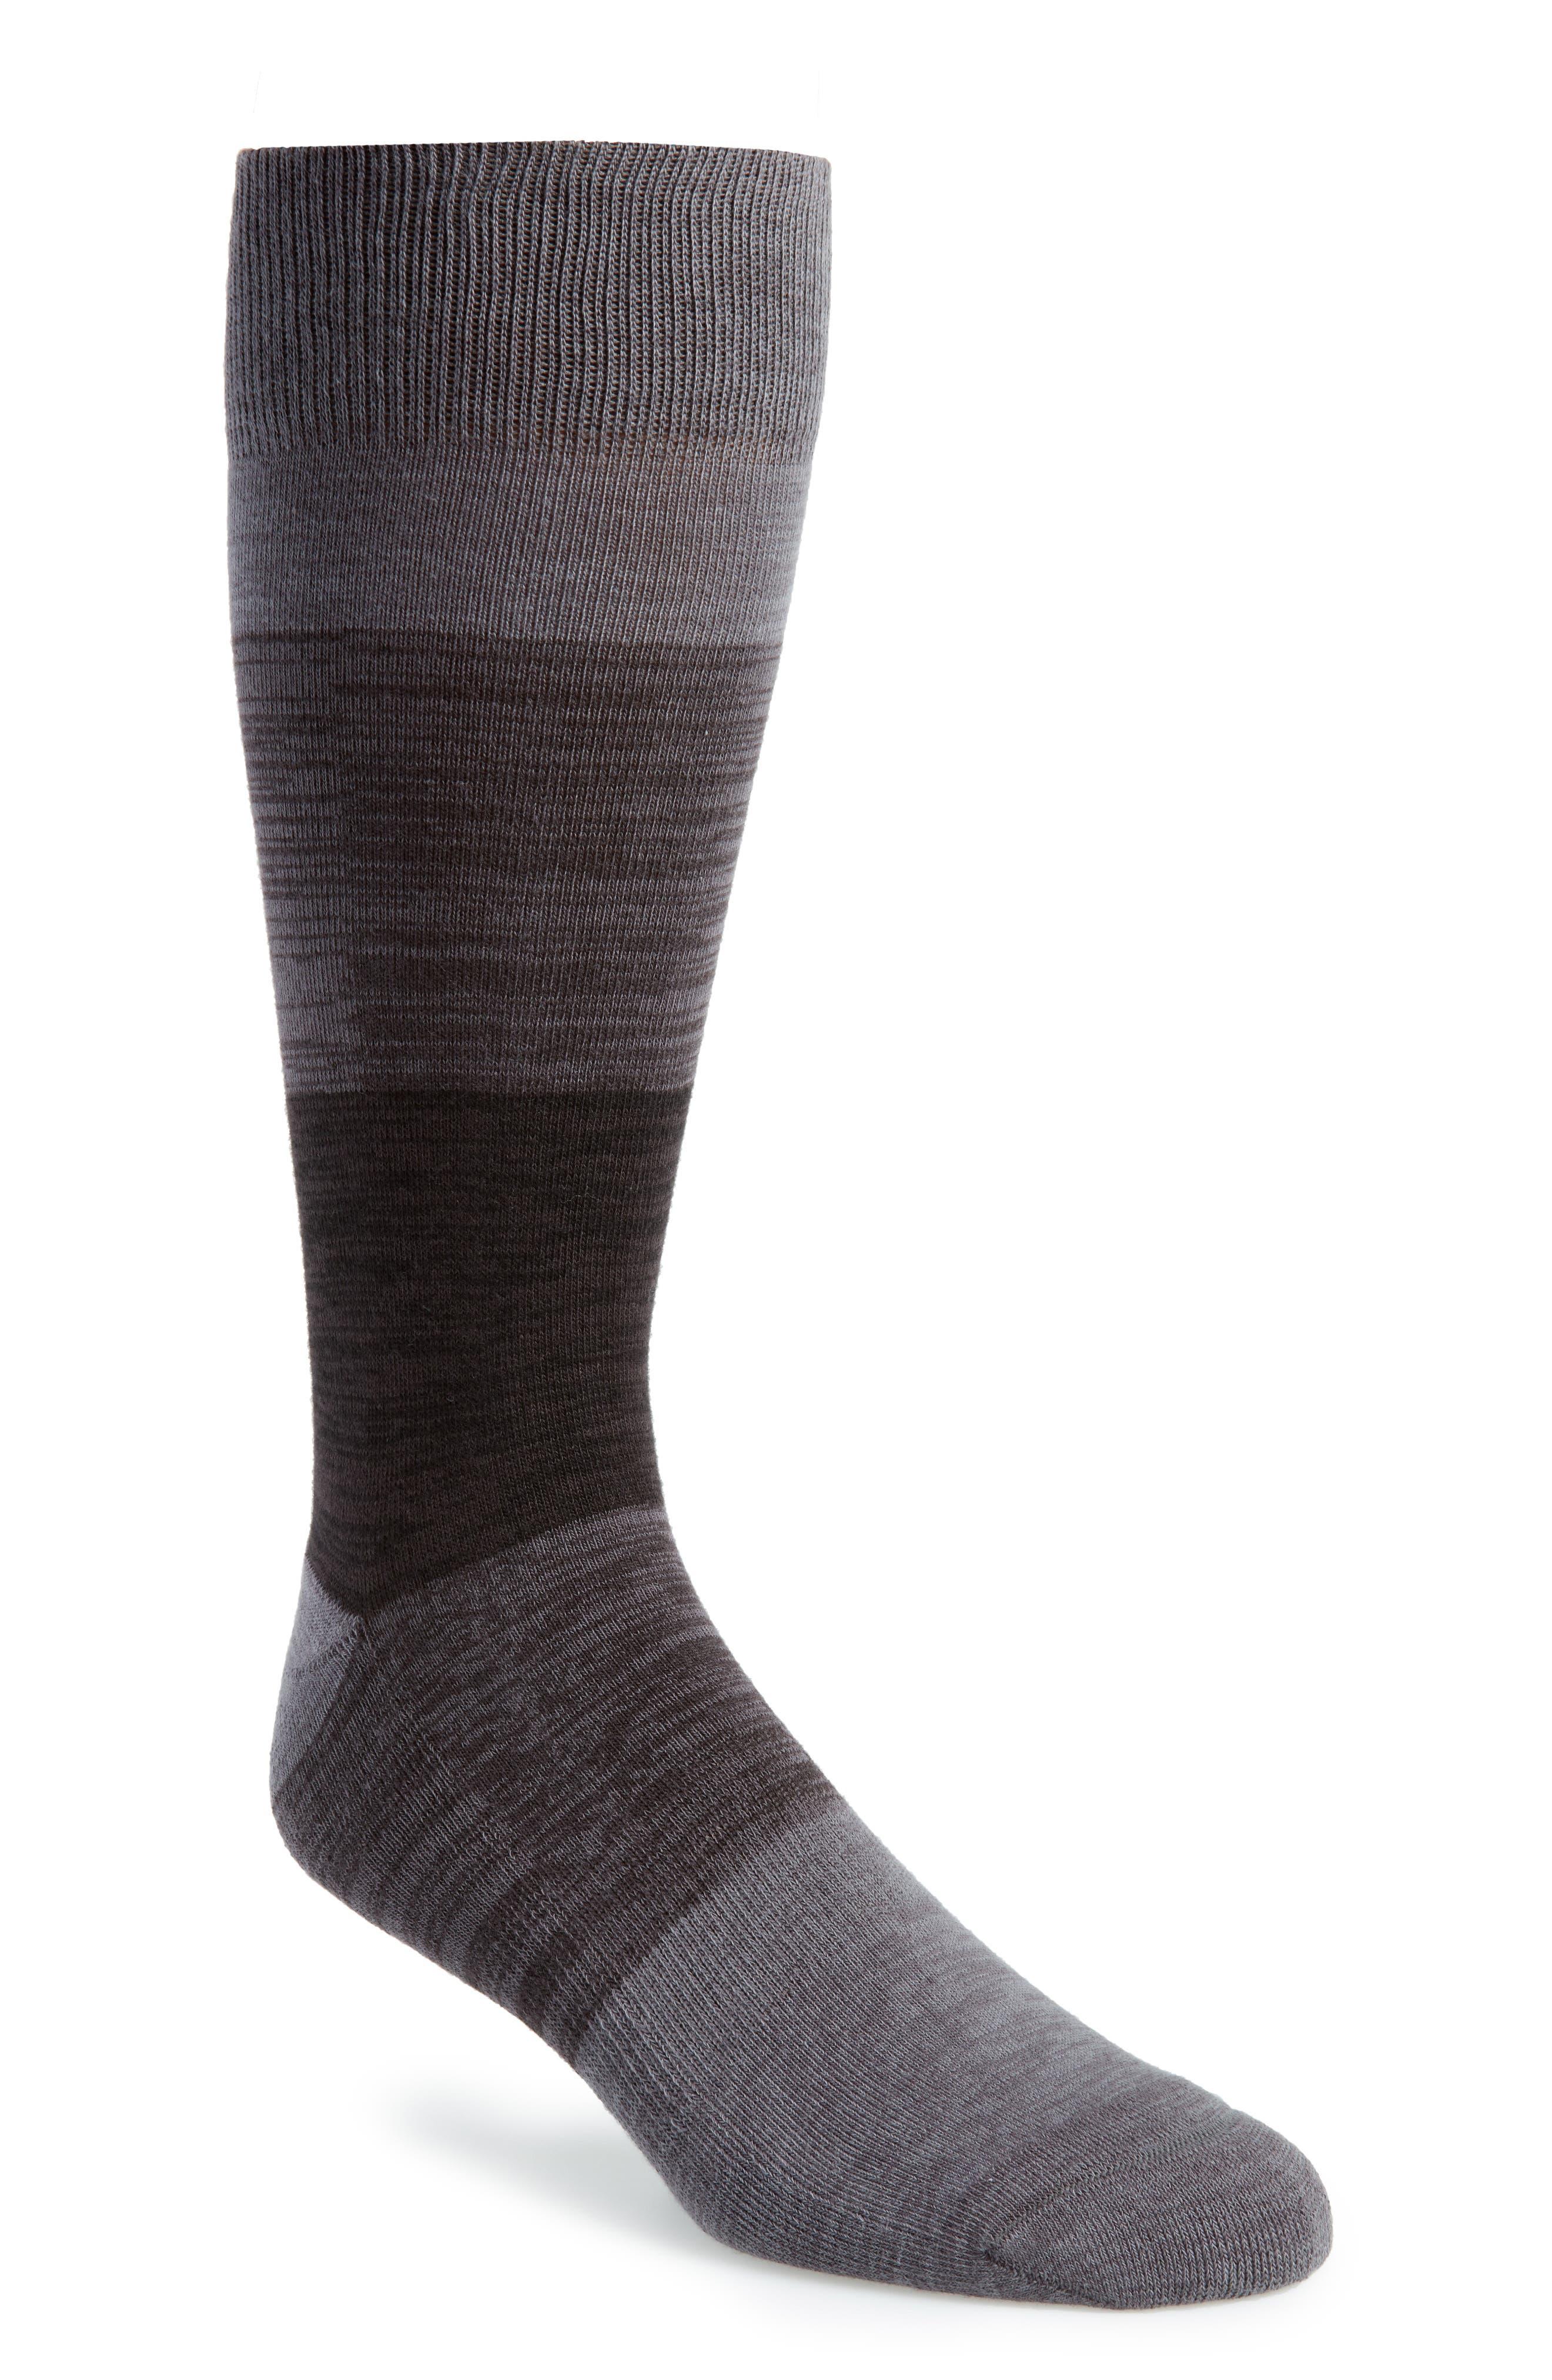 NORDSTROM MEN'S SHOP Free Run Gradient Crew Socks, Main, color, 021